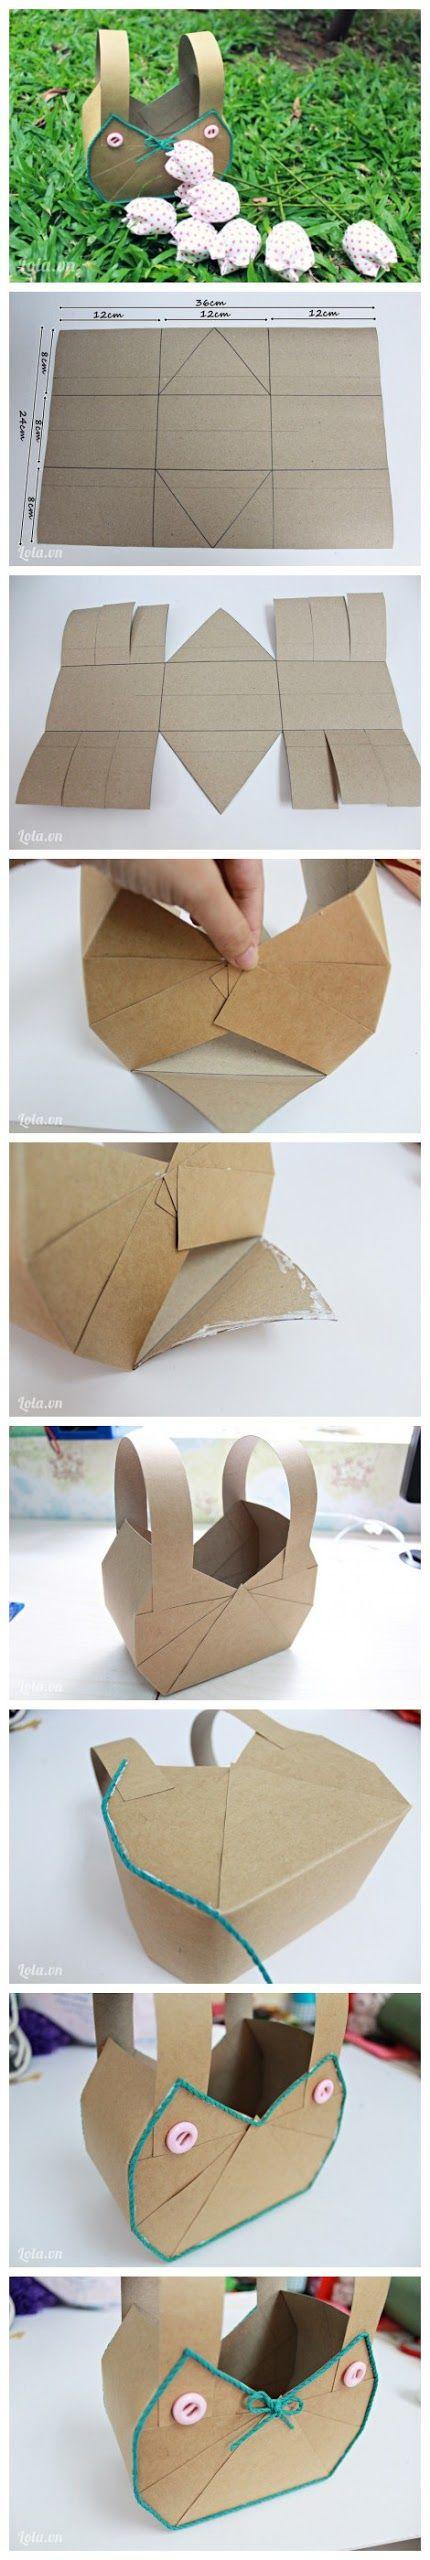 Easy Way to Make Paper Basket